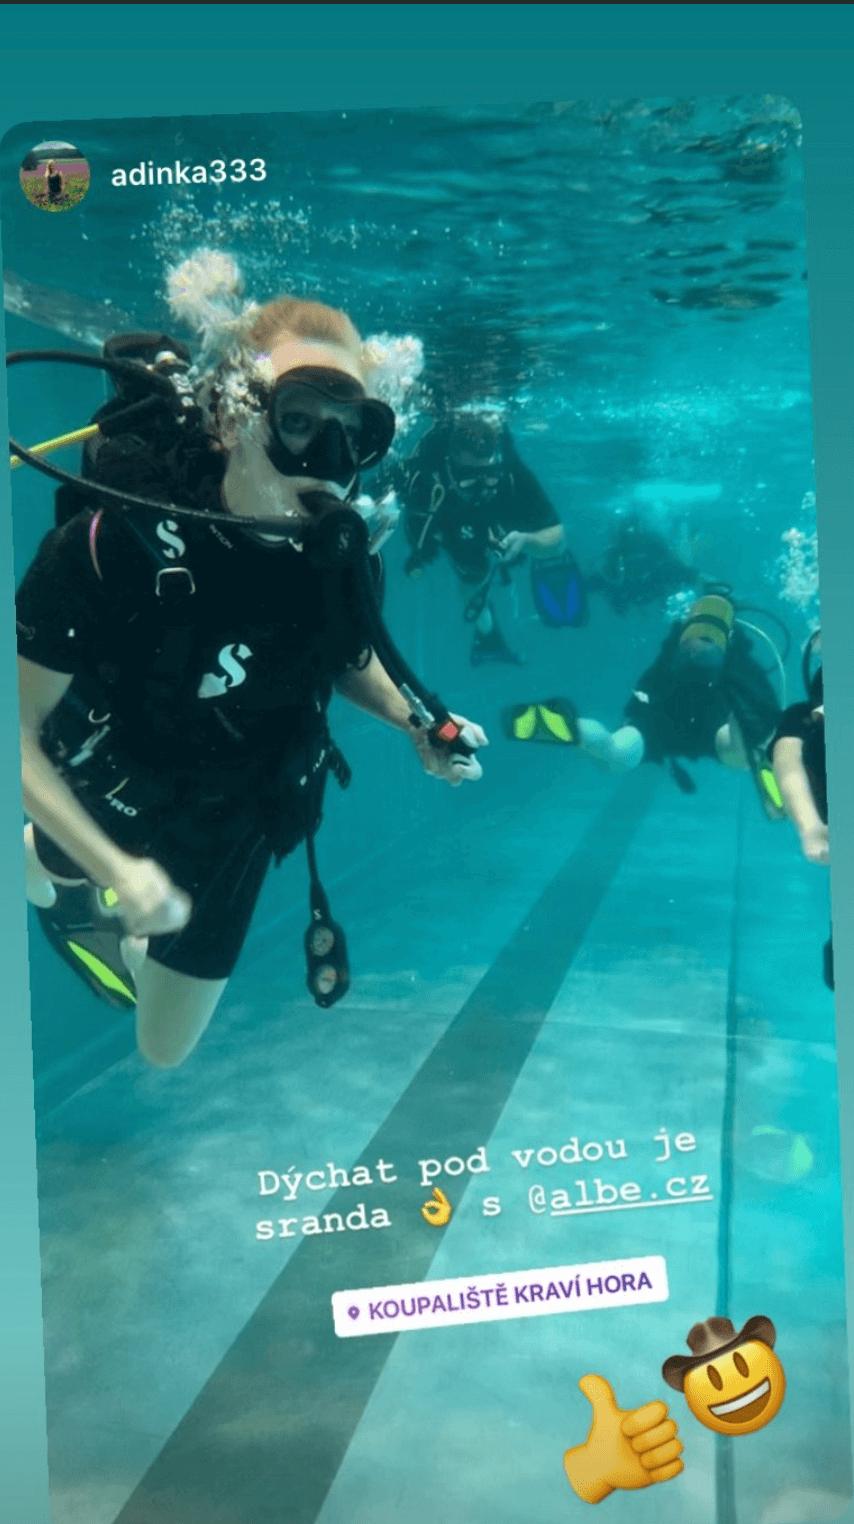 ALBE - Centrum potápění Brno |